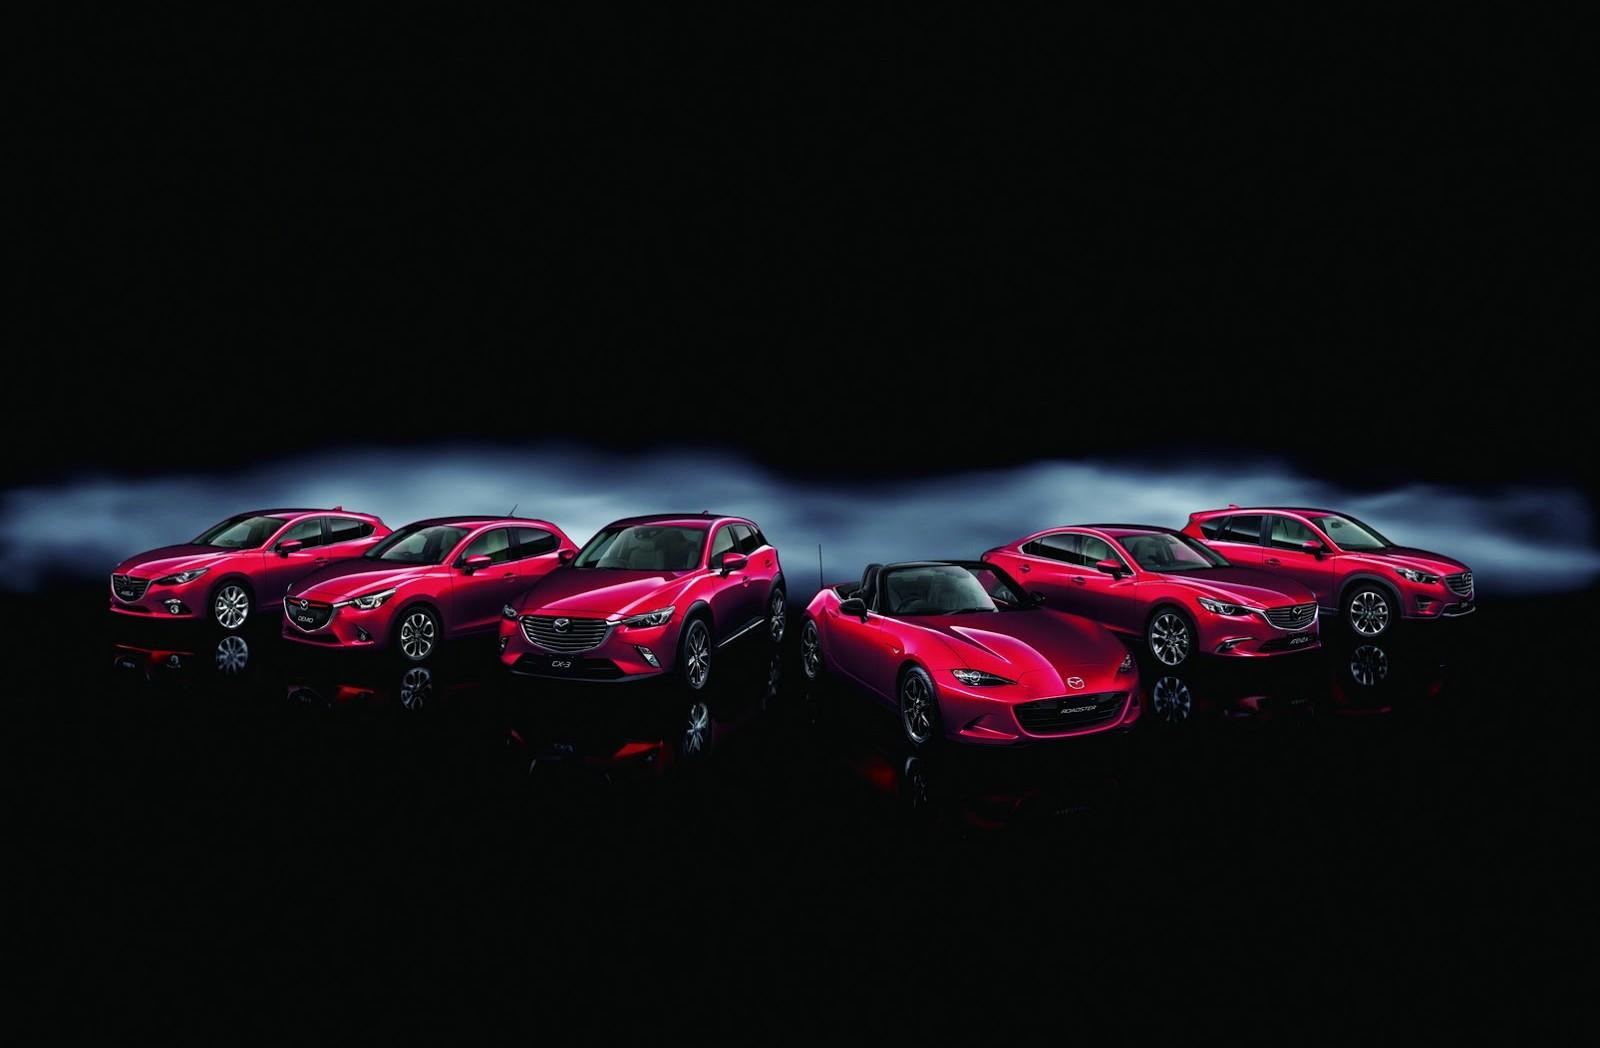 Mazda celebrates 3 million cars built, from 2011